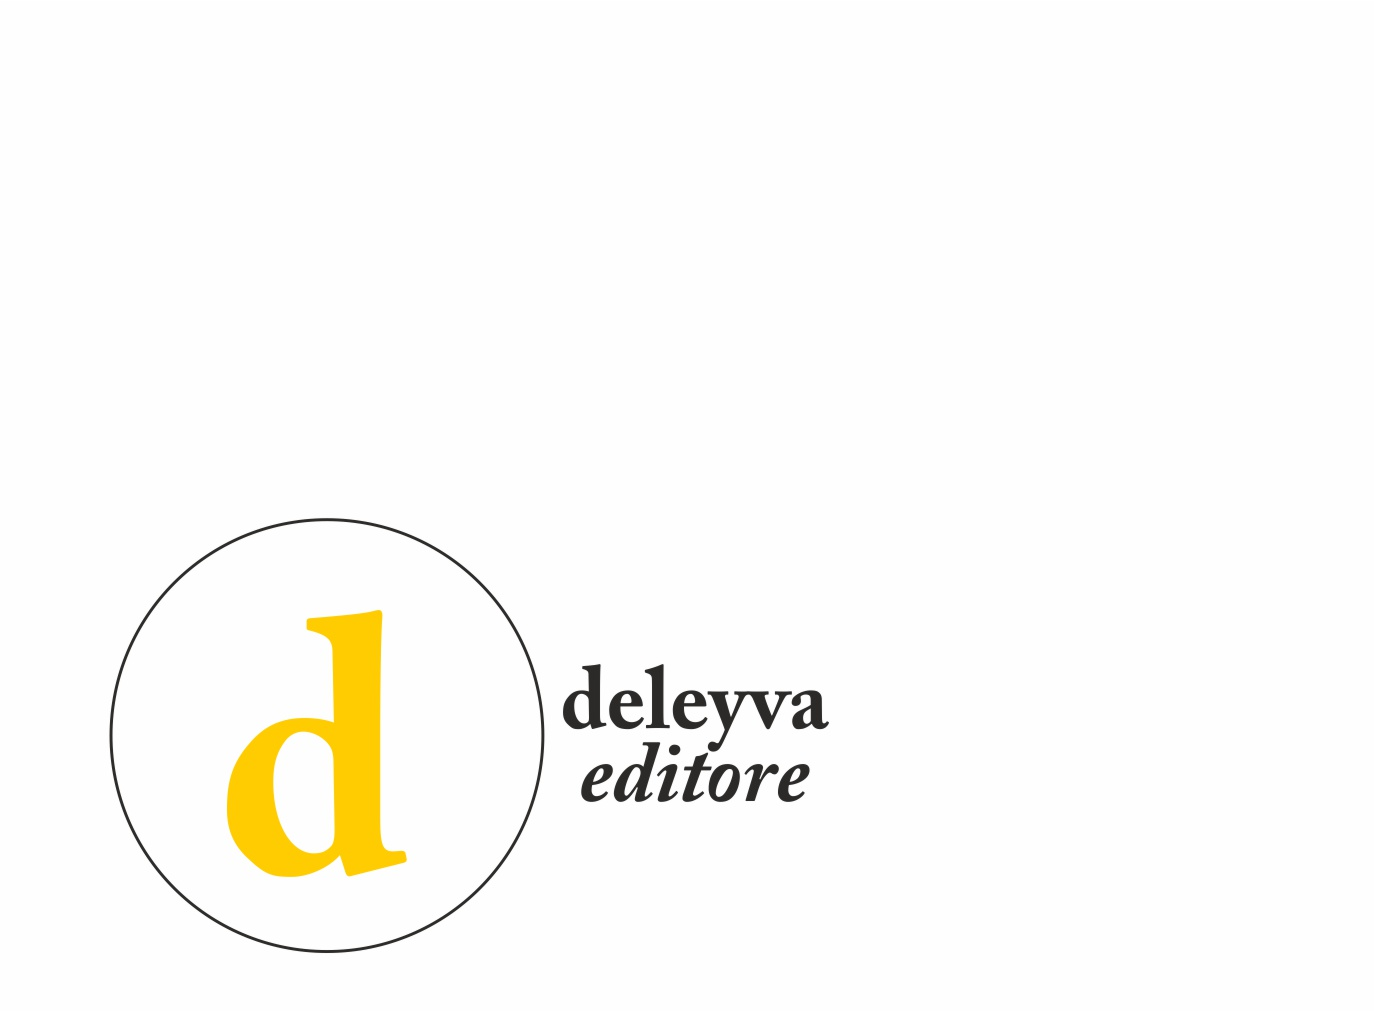 Deleyva Editore